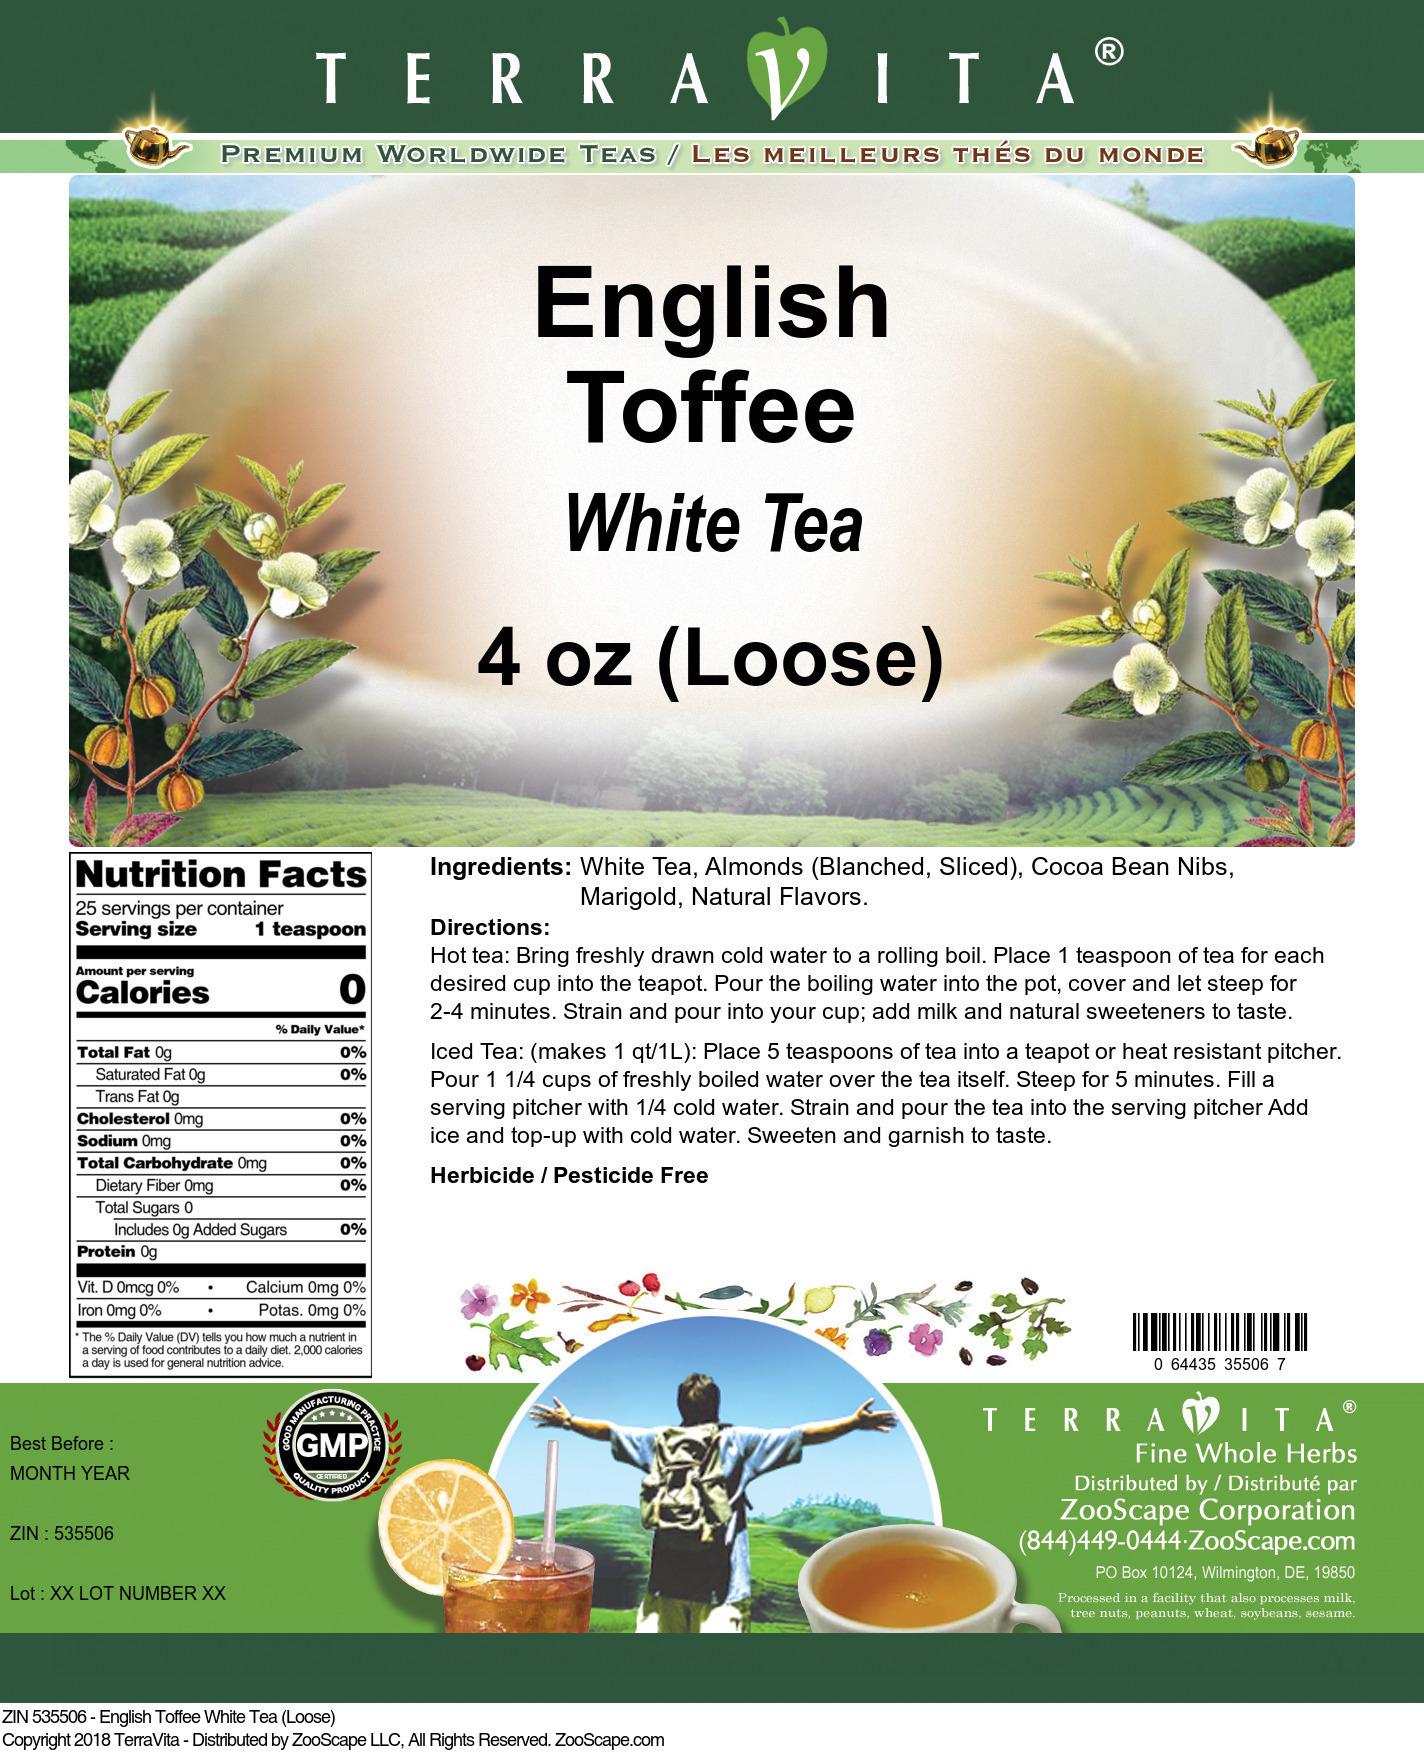 English Toffee White Tea (Loose)